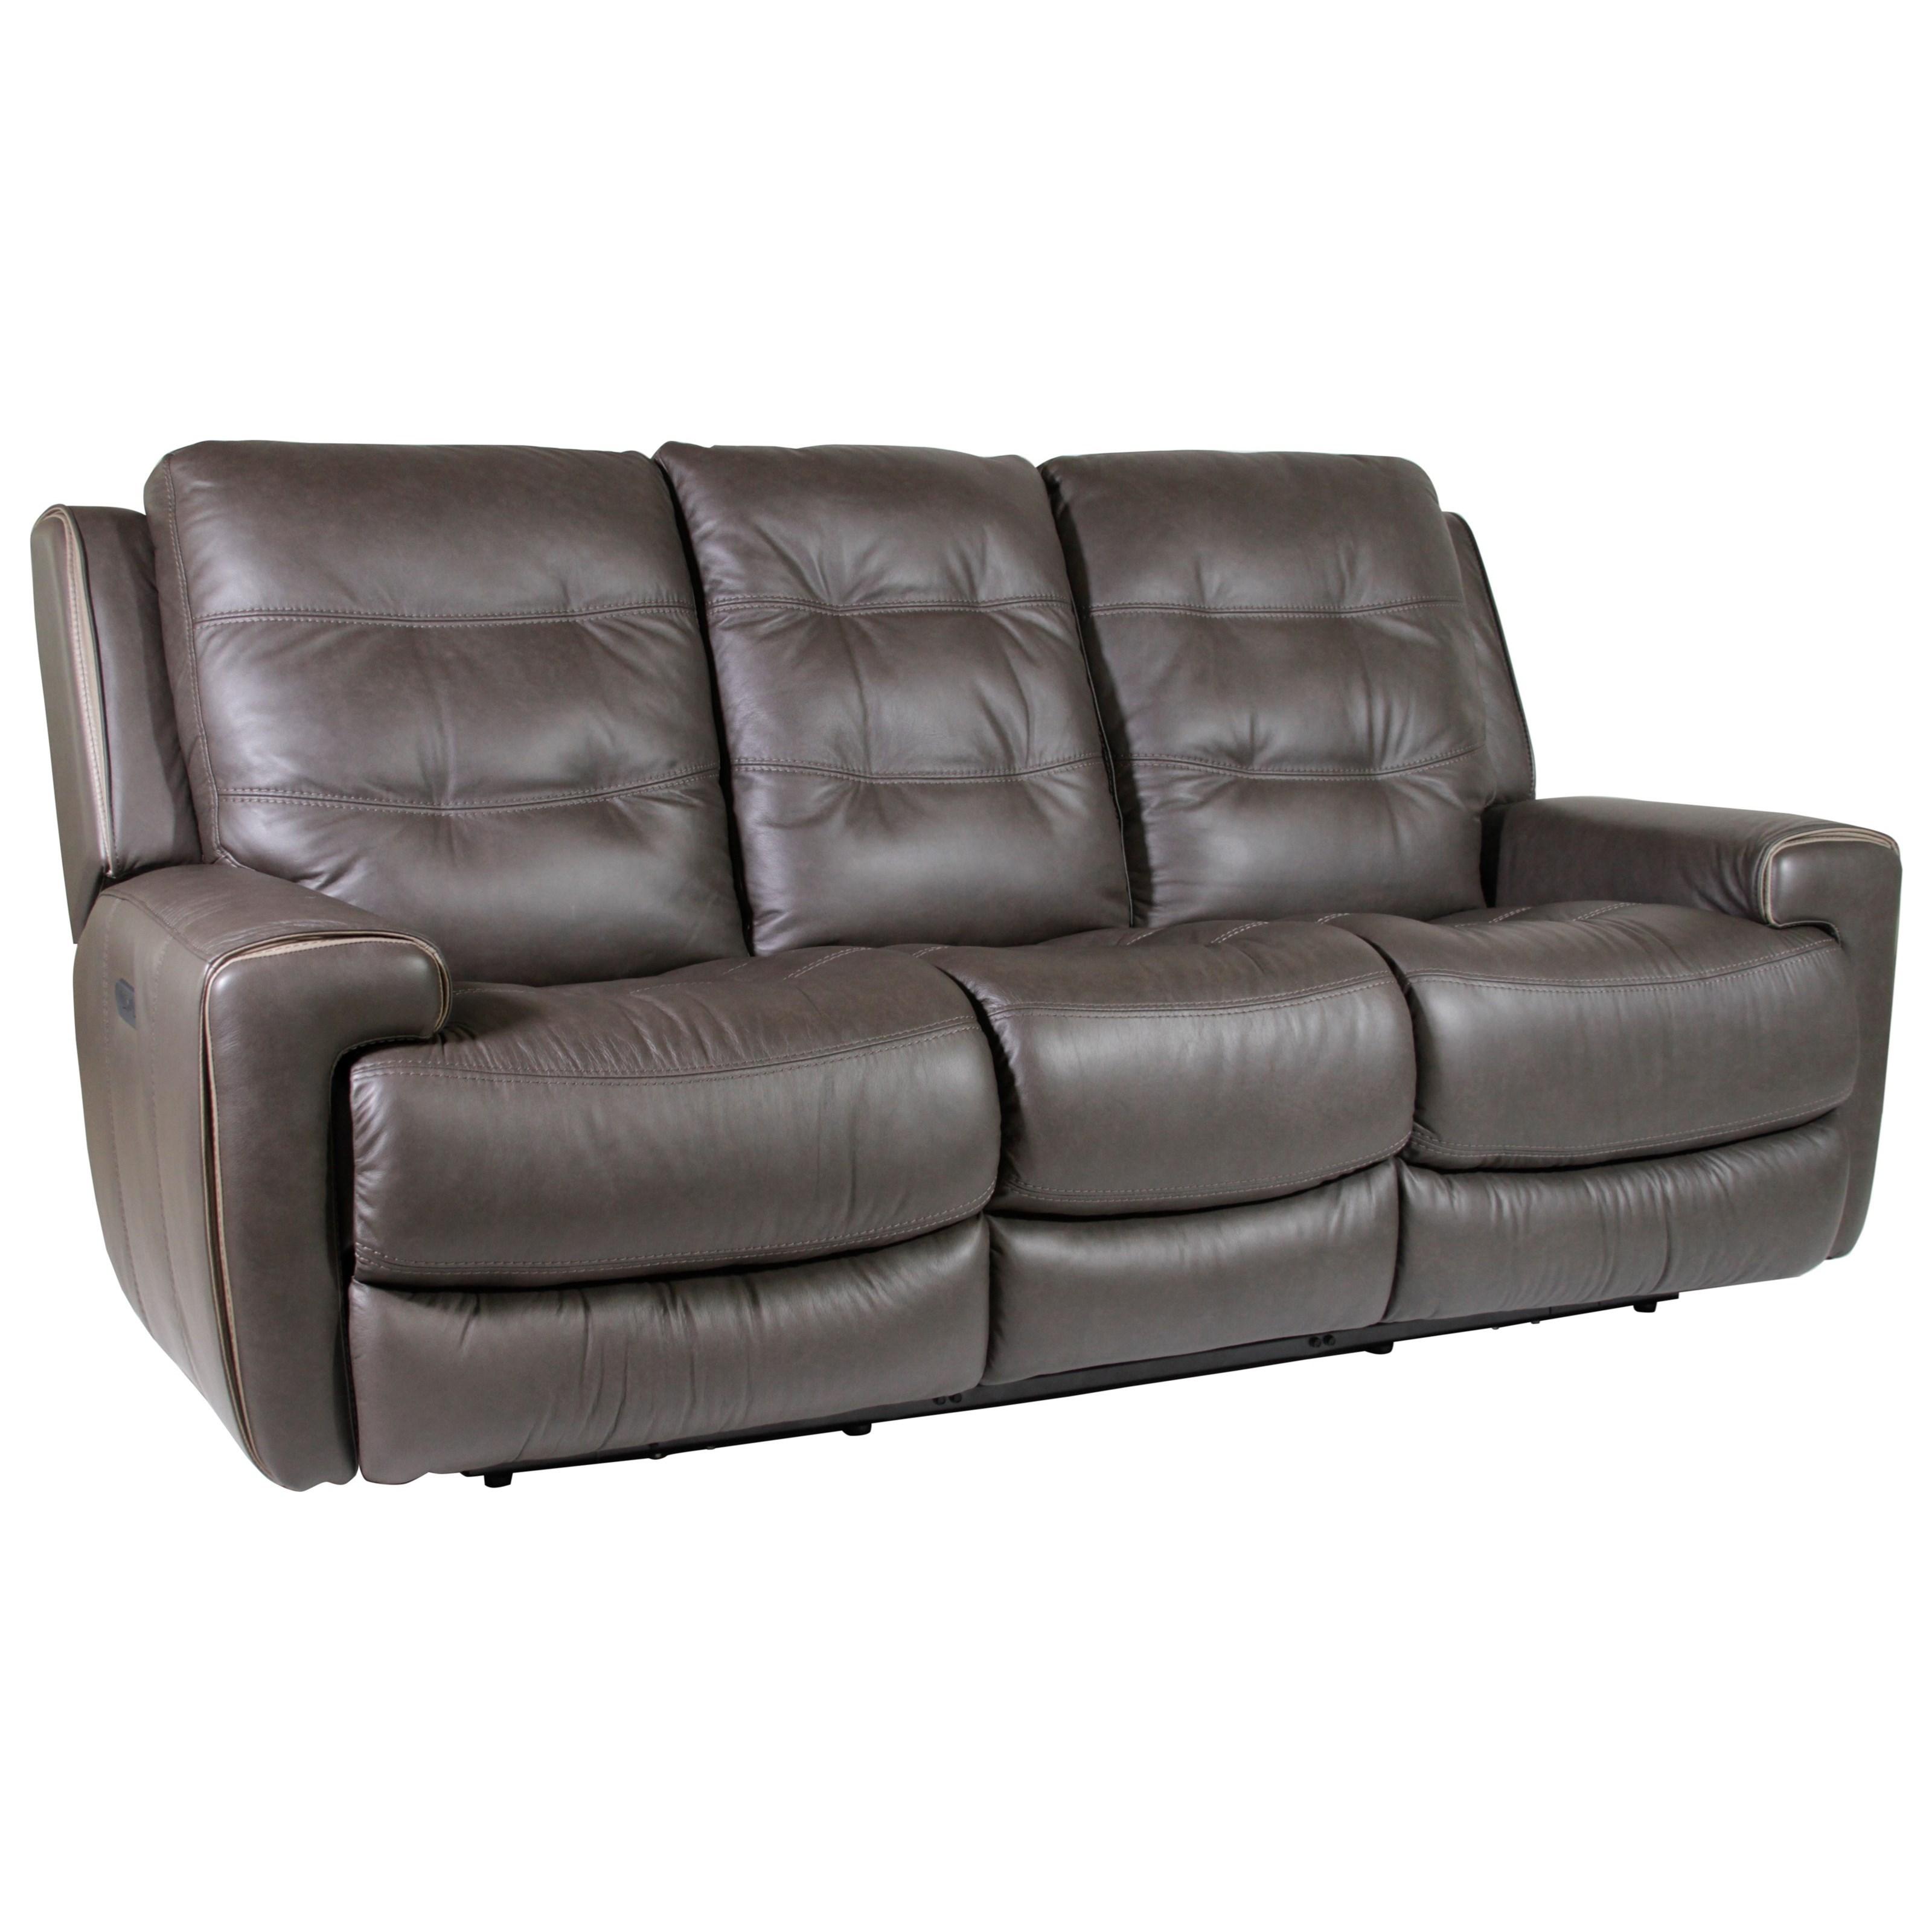 flexsteel thornton sectional sofa lowes feet 5535